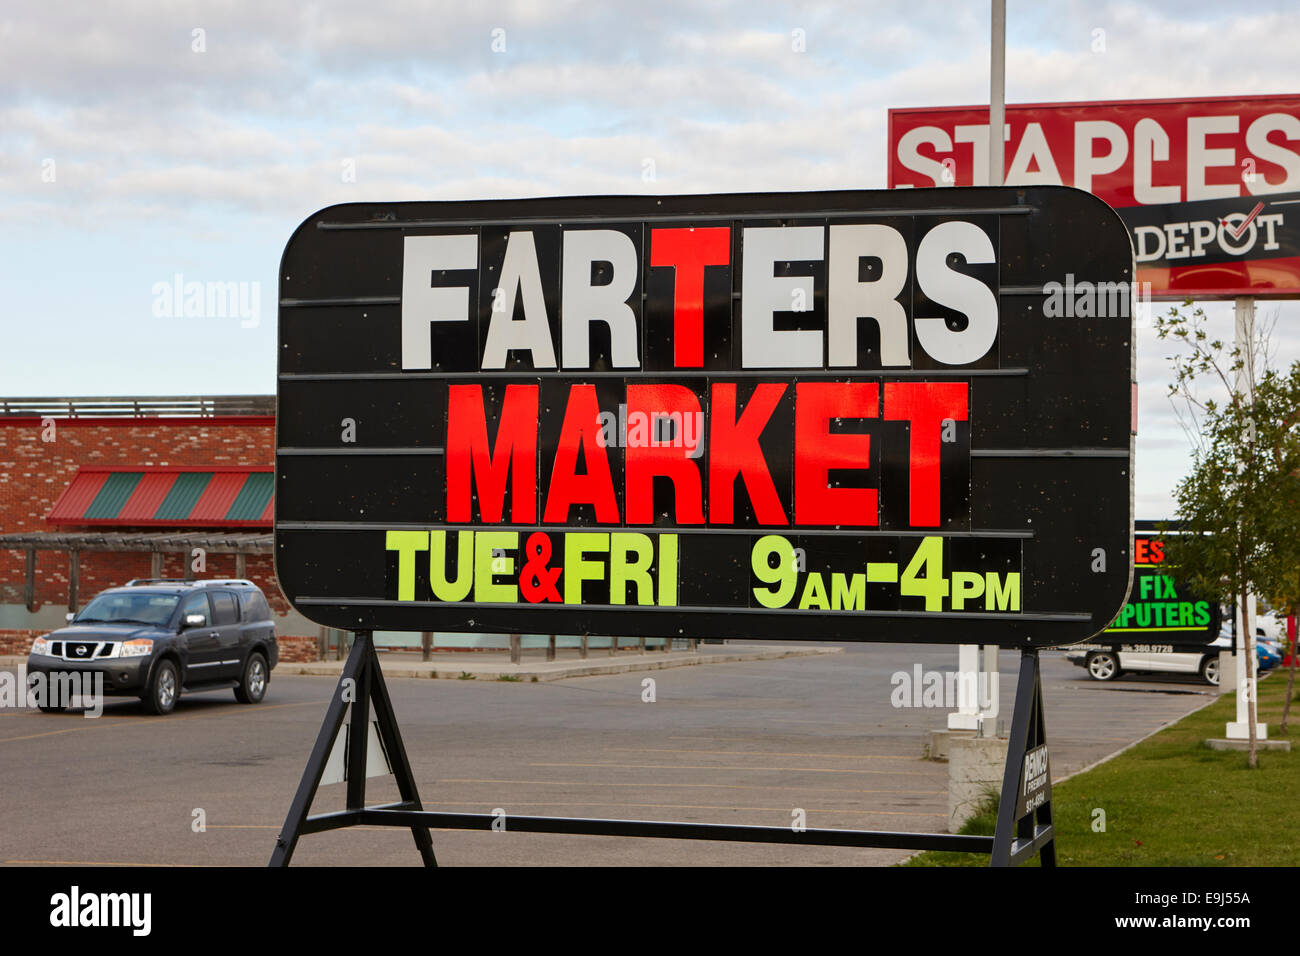 farmers market sign changed to farters market Saskatchewan Canada - Stock Image